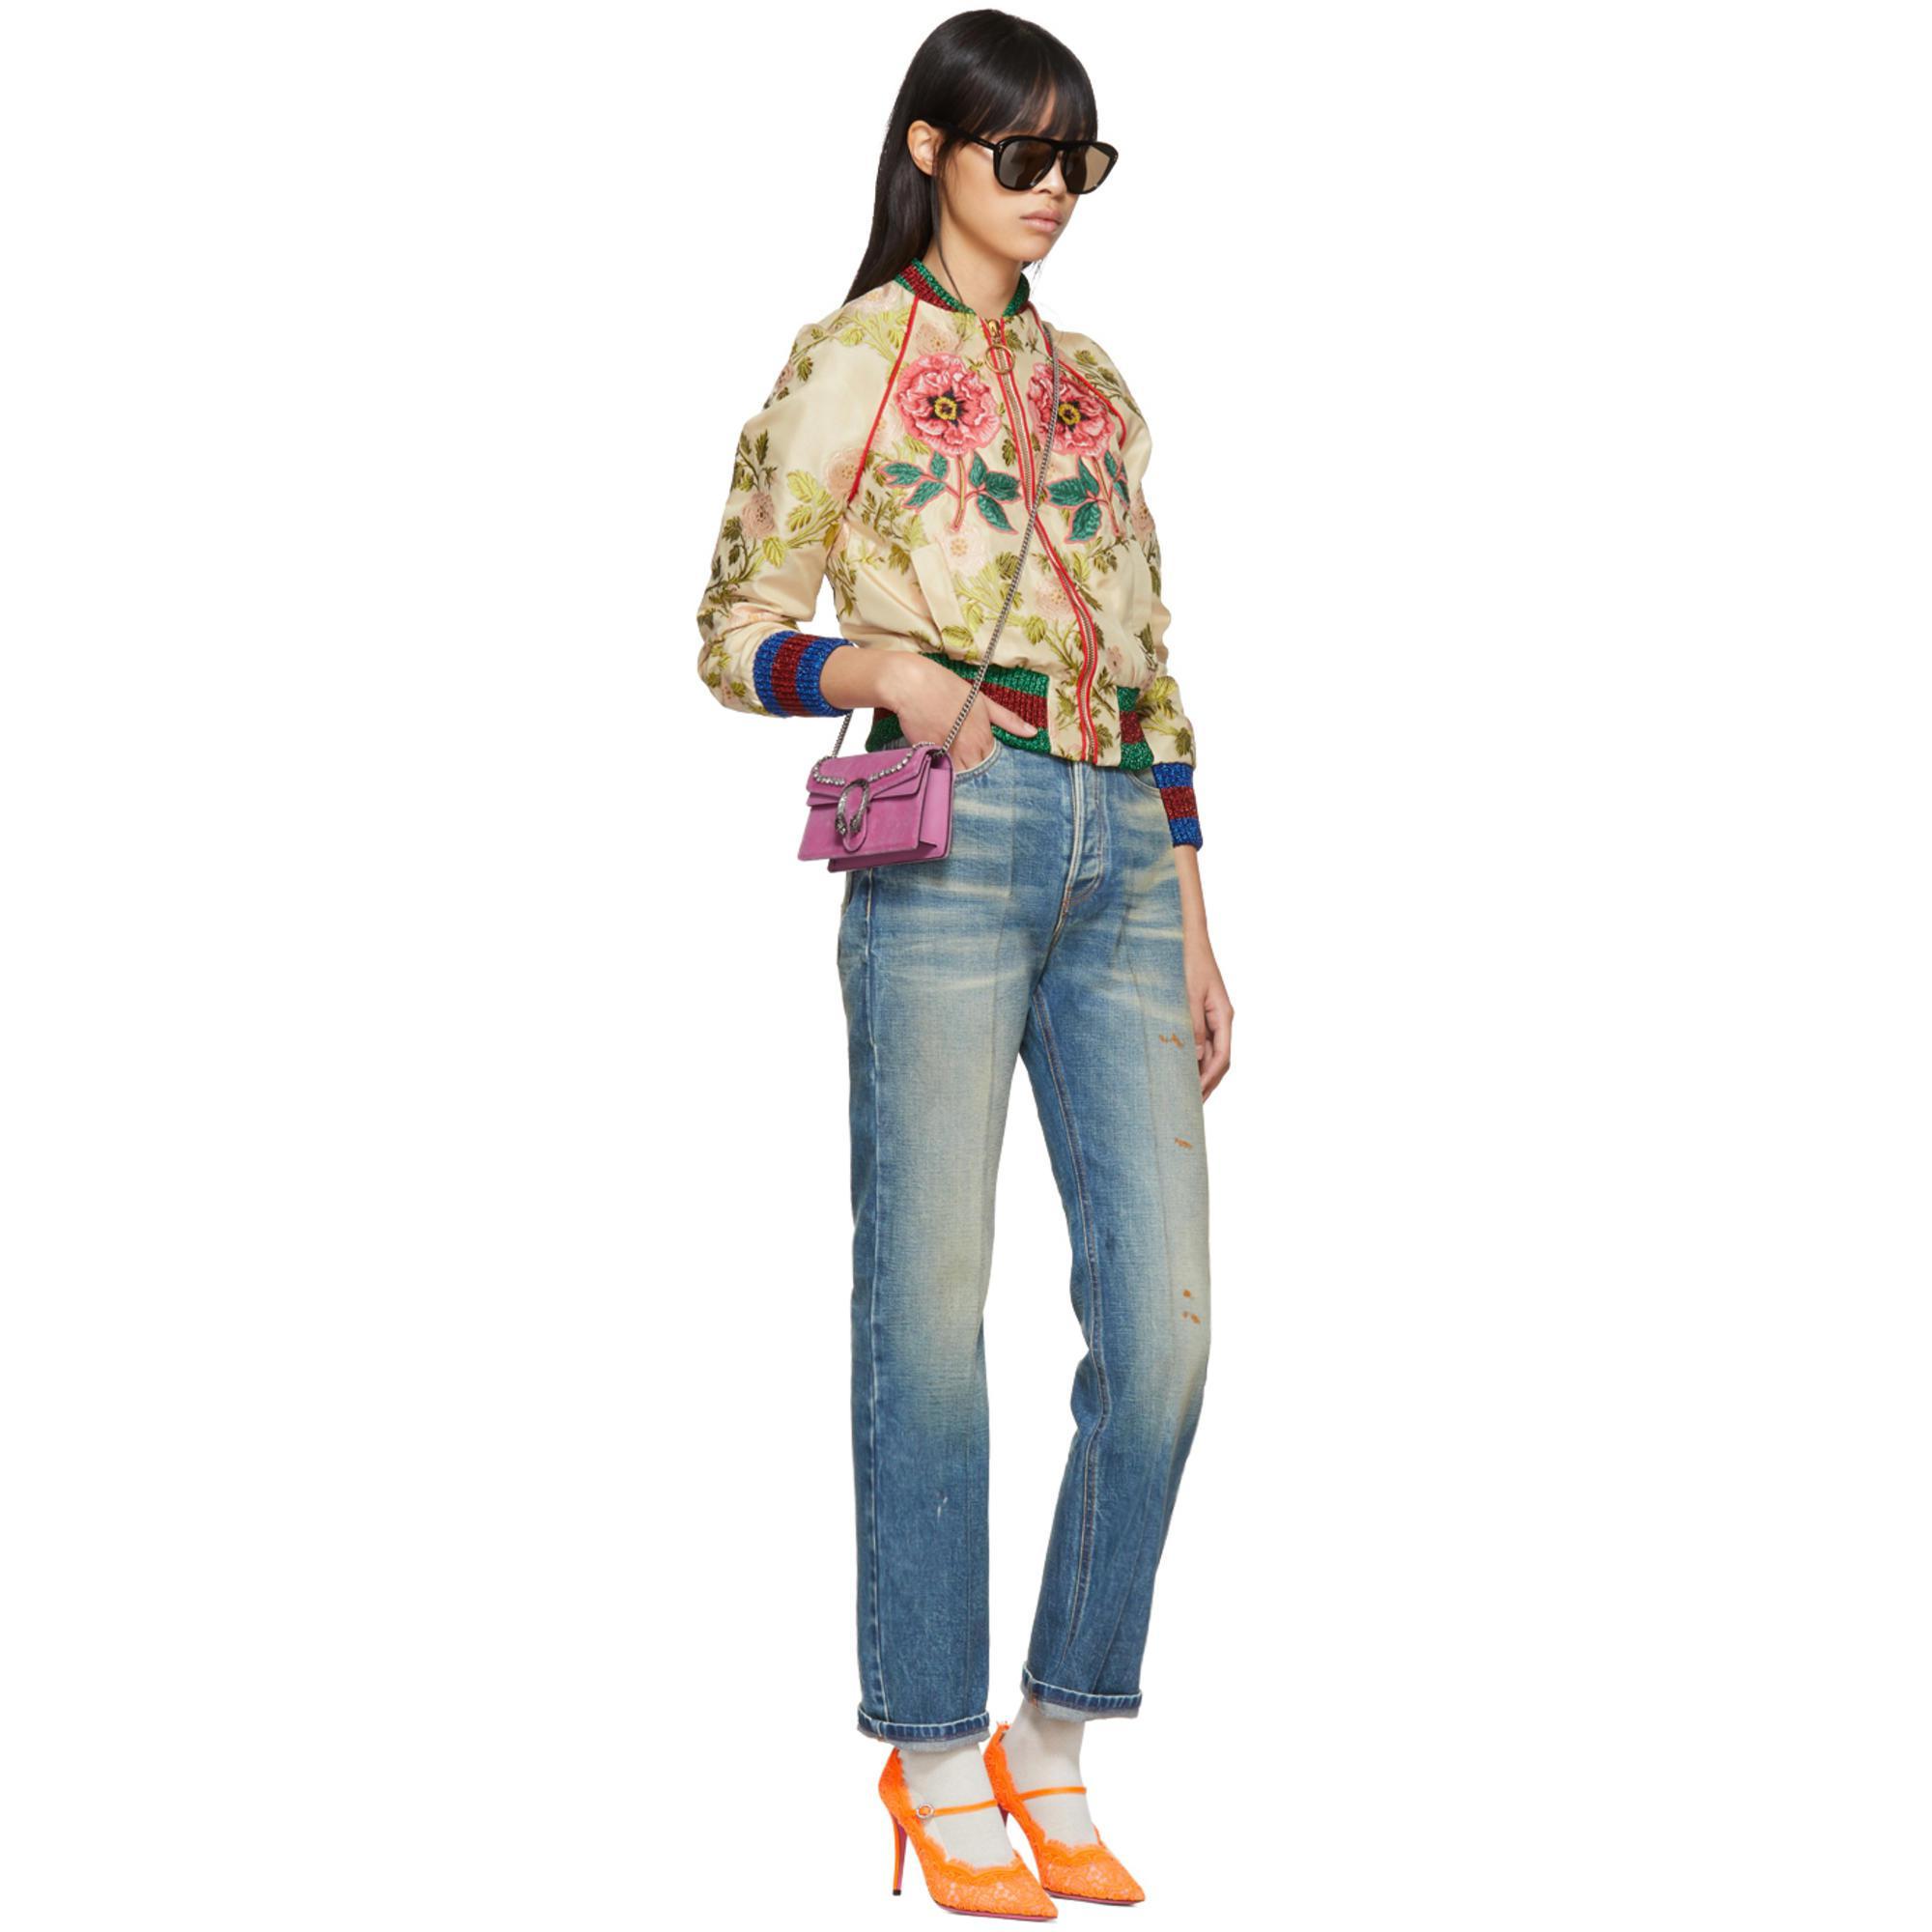 Lyst - Gucci Pink Velvet Super Mini Dionysus Bag in Pink e9dda54eb7b